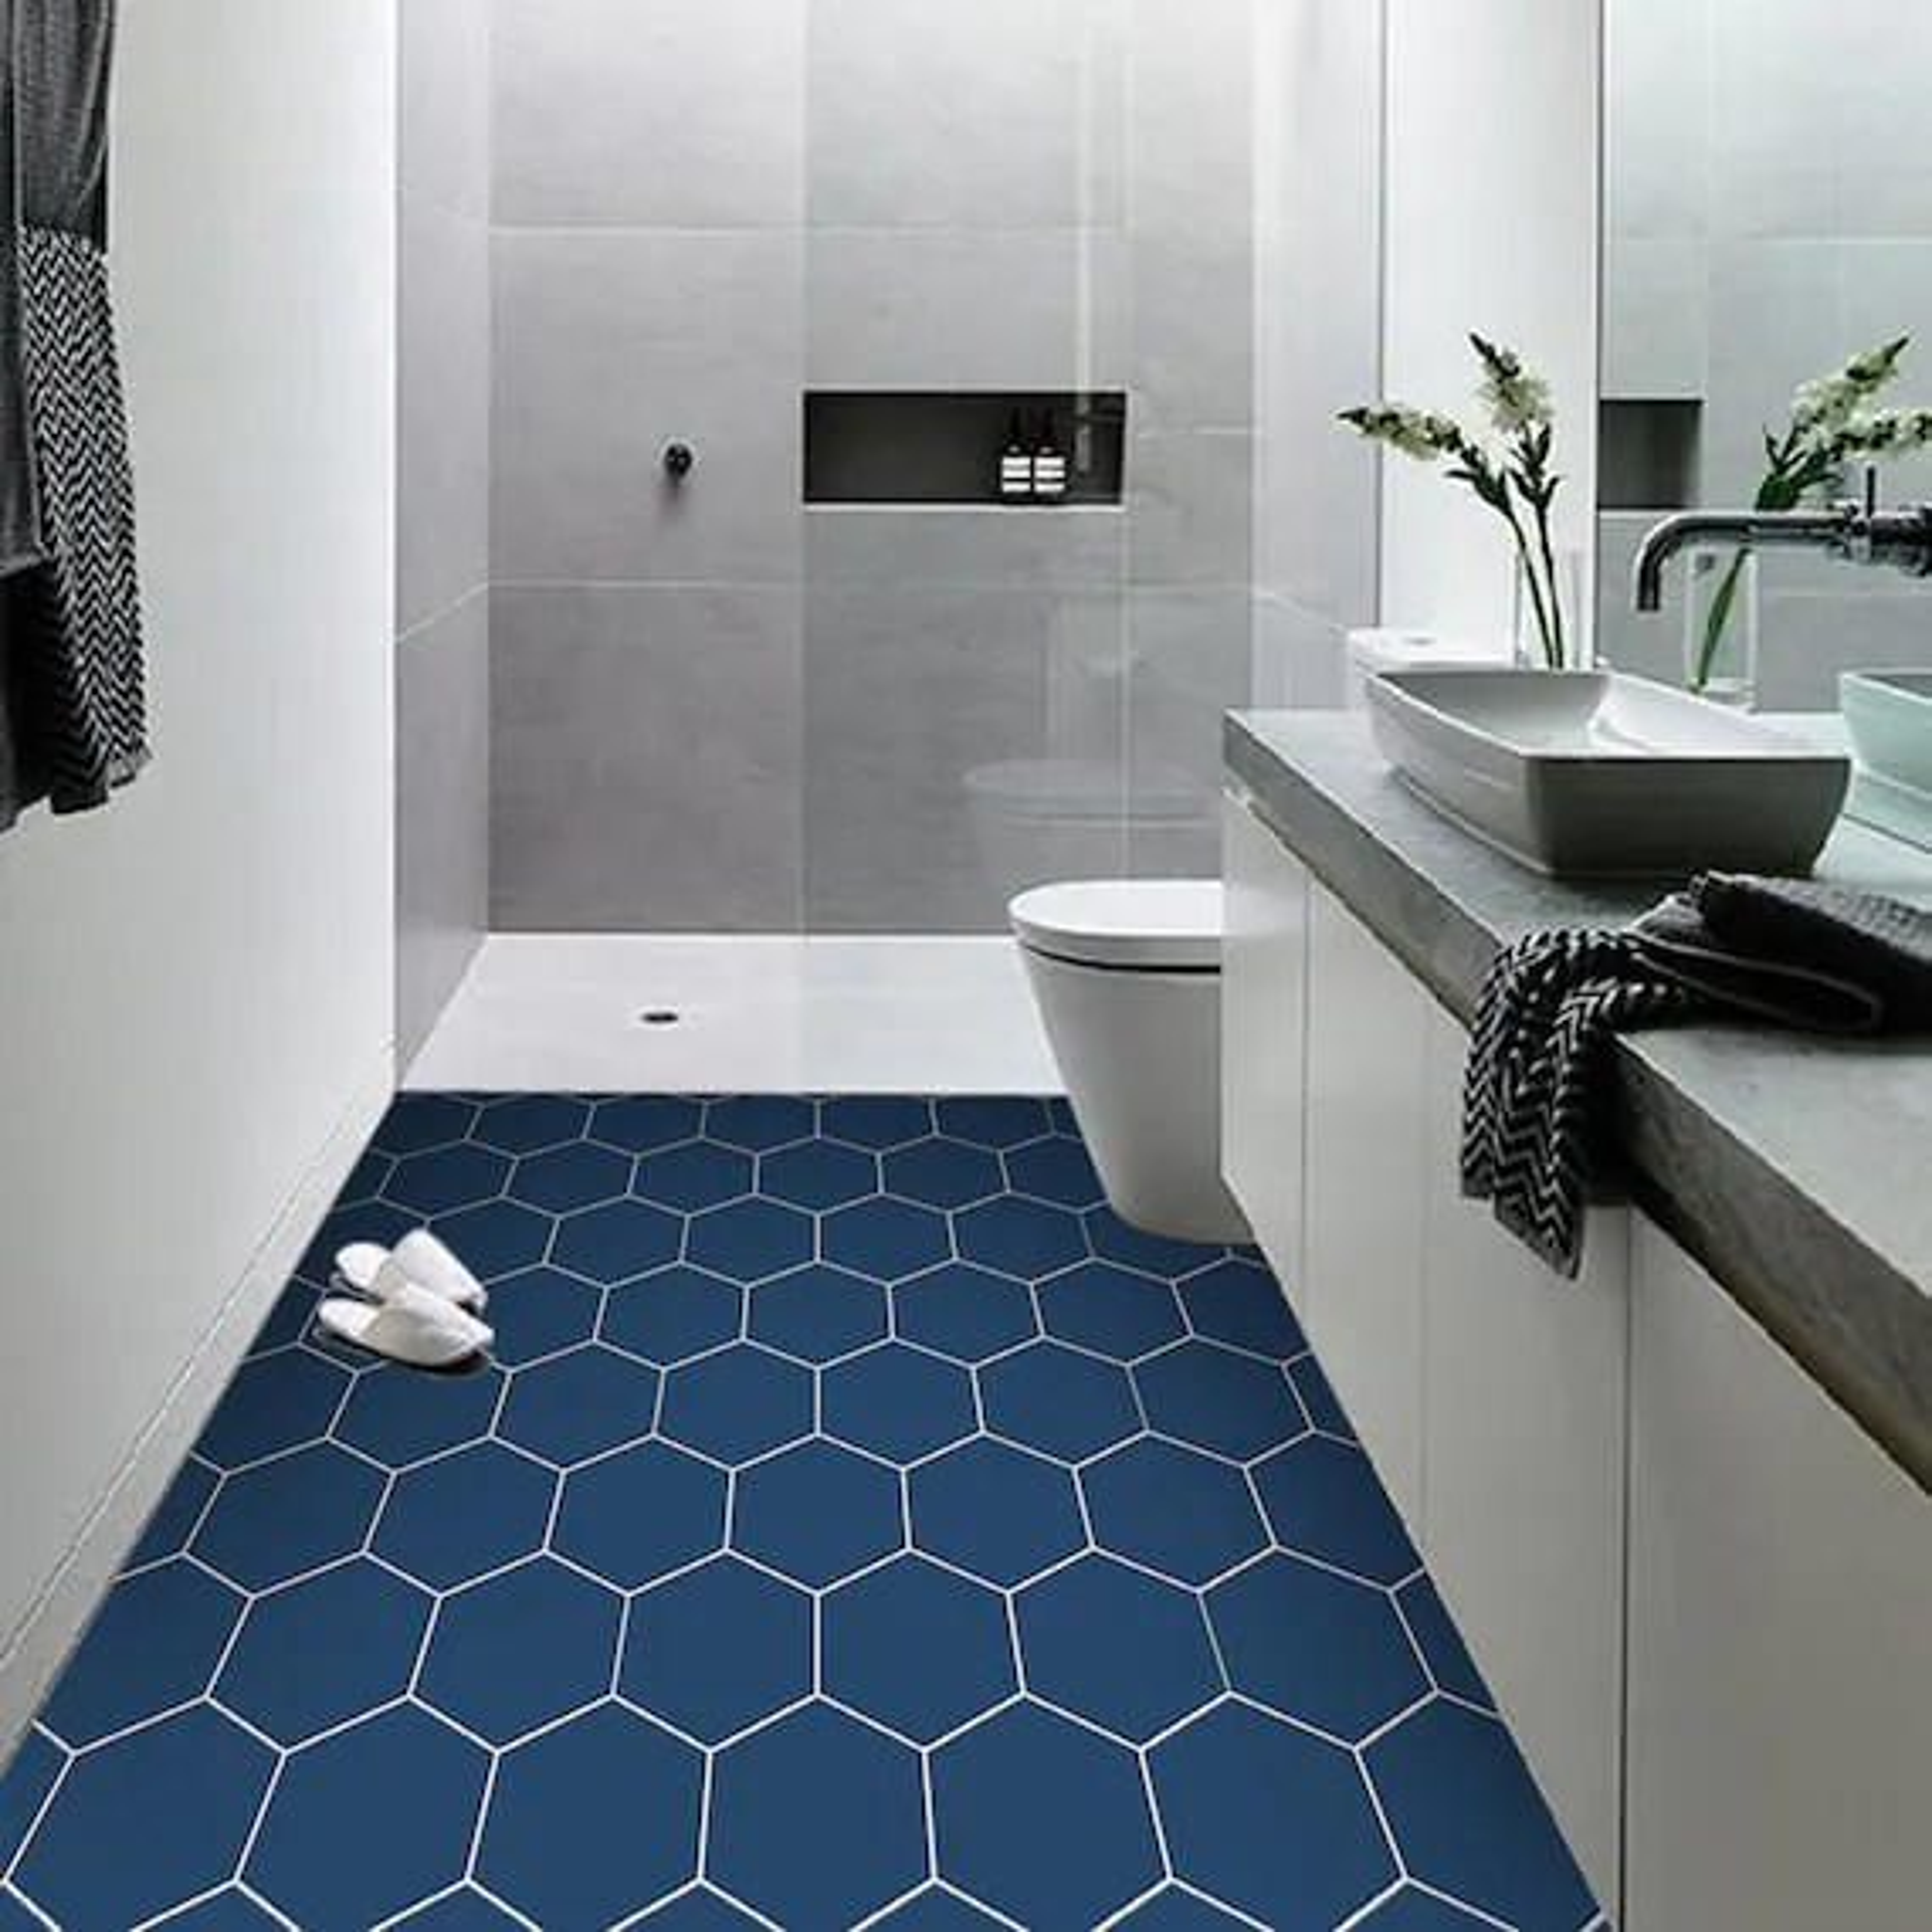 vinyl floor tile sticker panel peel and stick decal hexa etsy